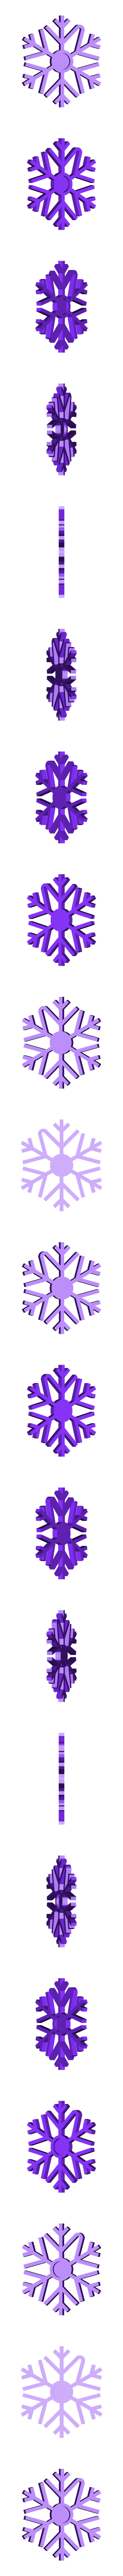 Snowflake.stl Download free STL file Snowflake Earrings • 3D printing object, Desktop_Makes